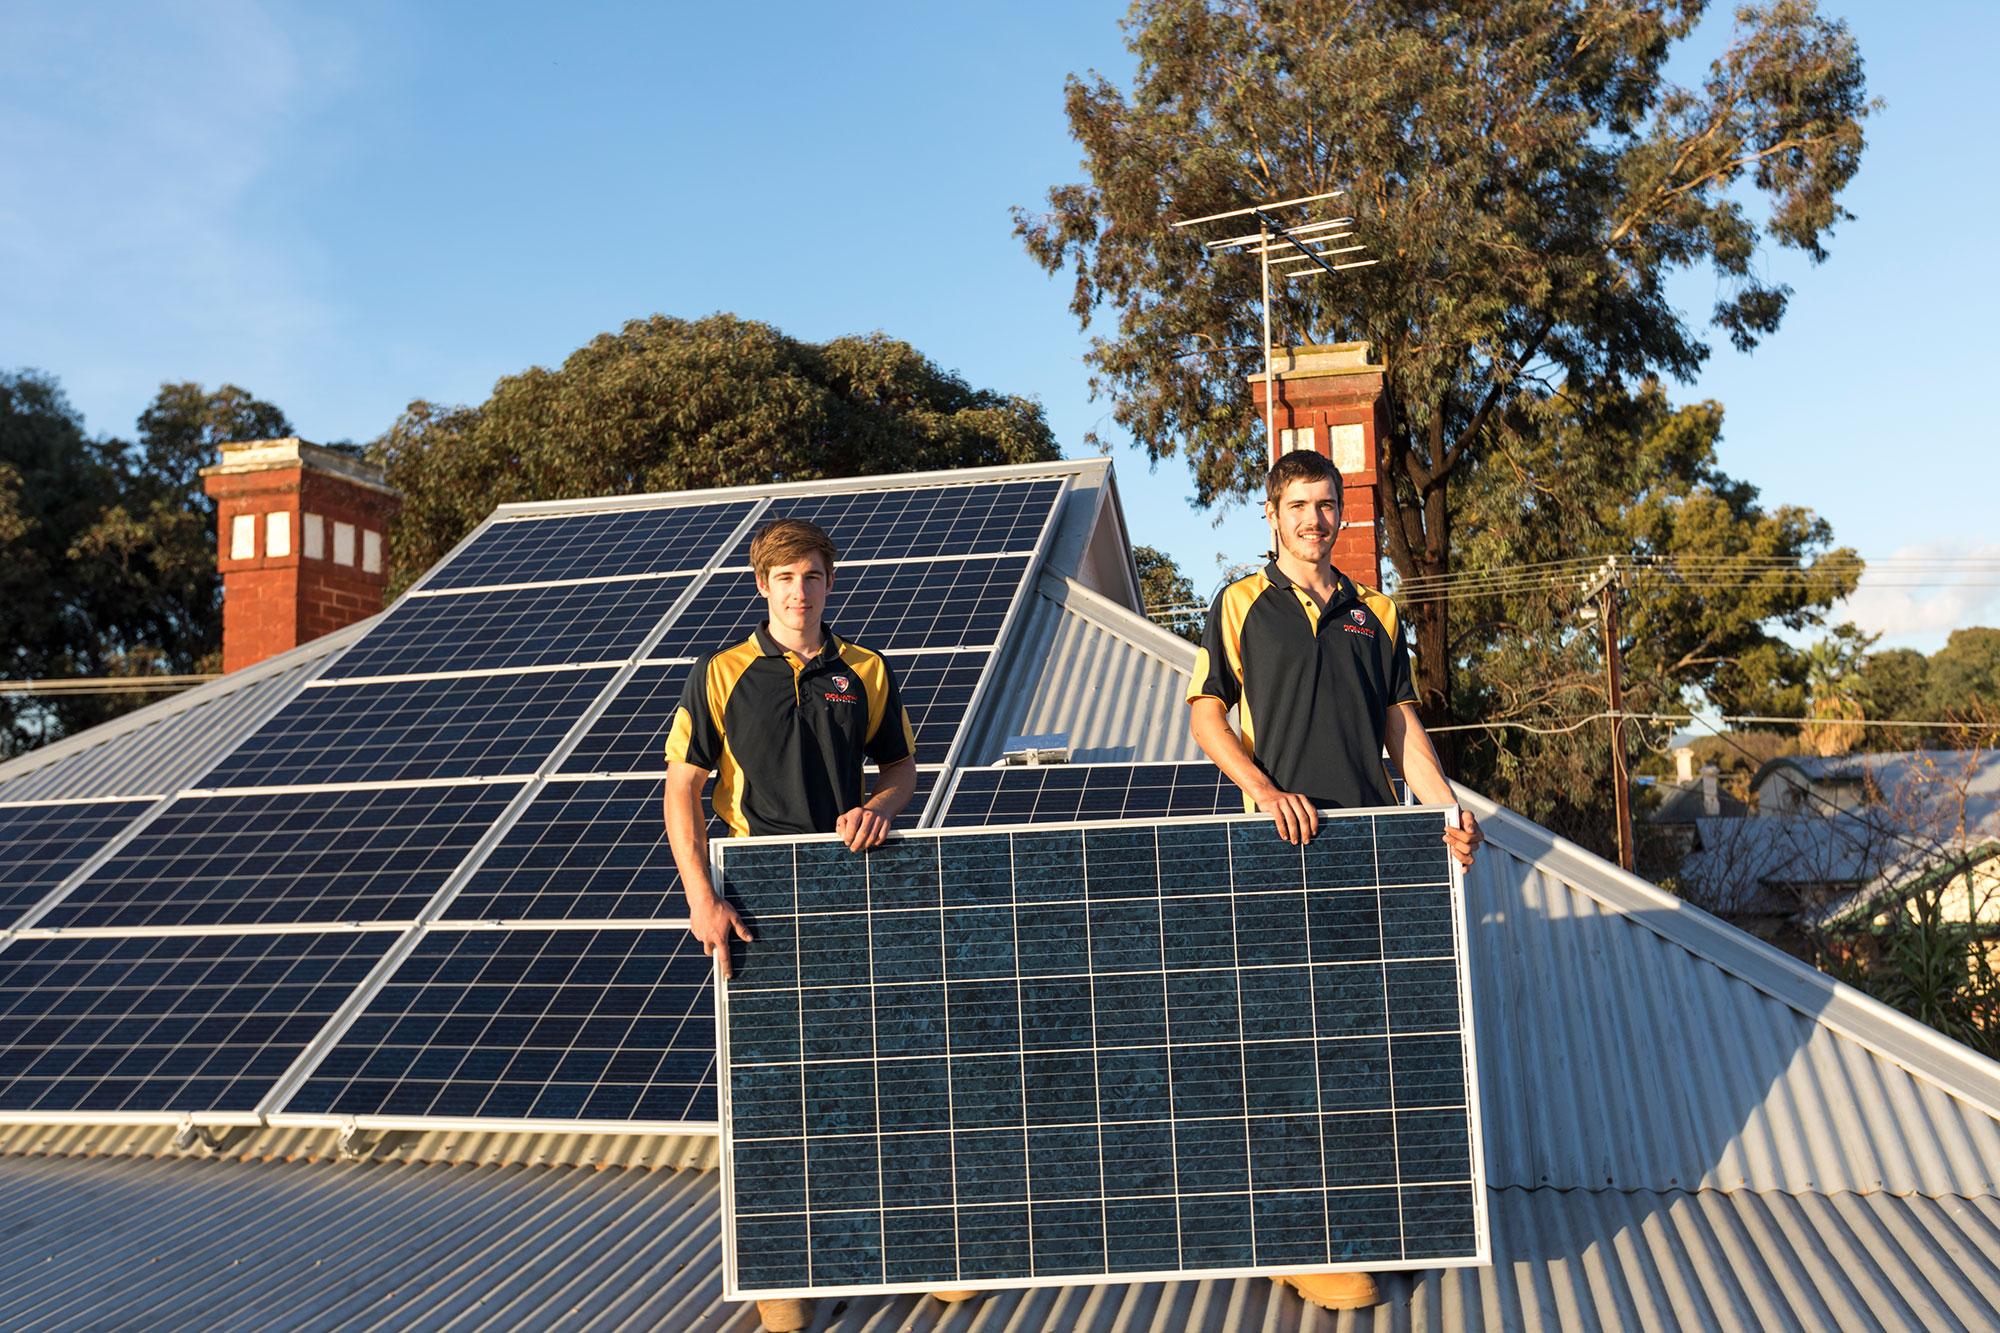 goliath-solar-friendly-installers-in-action.jpg